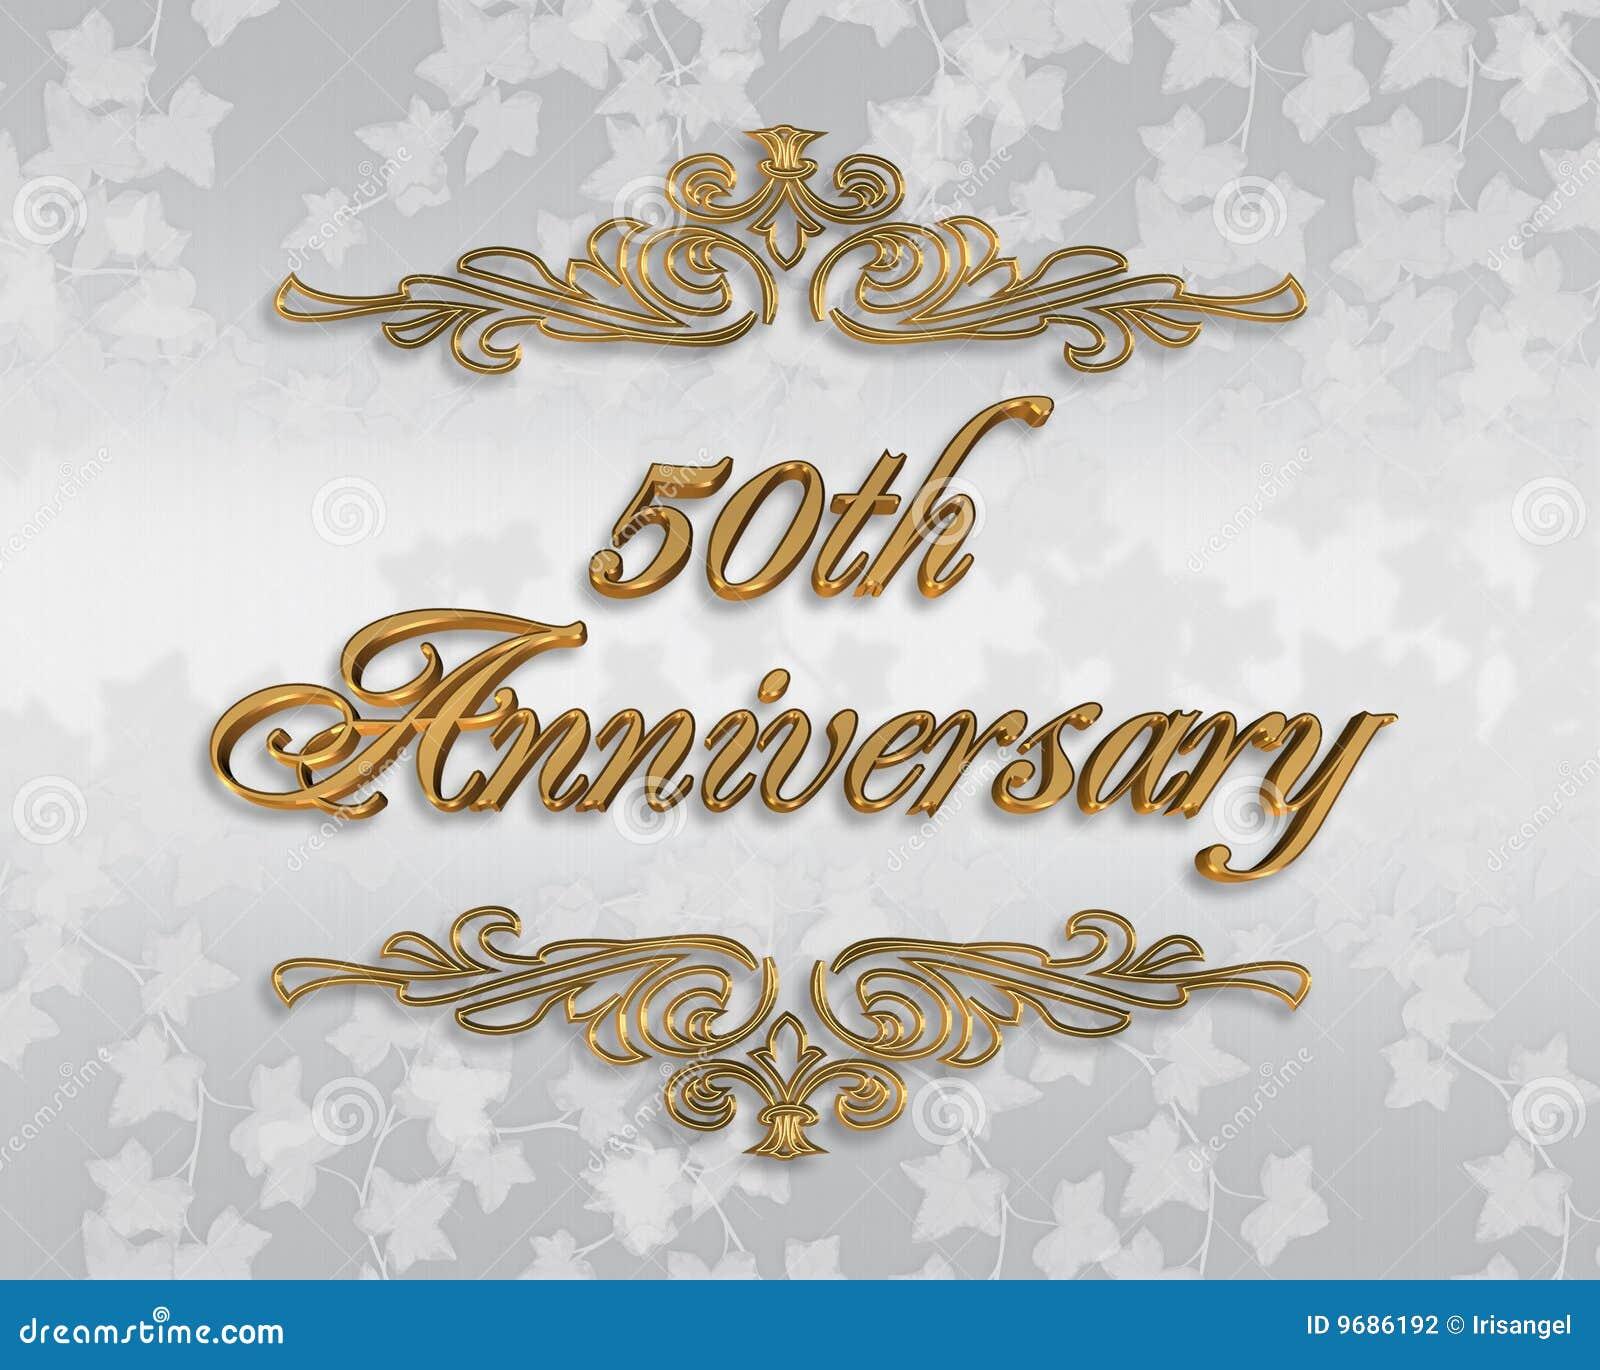 50th anniversary invitation templates free - Kardas.klmphotography.co